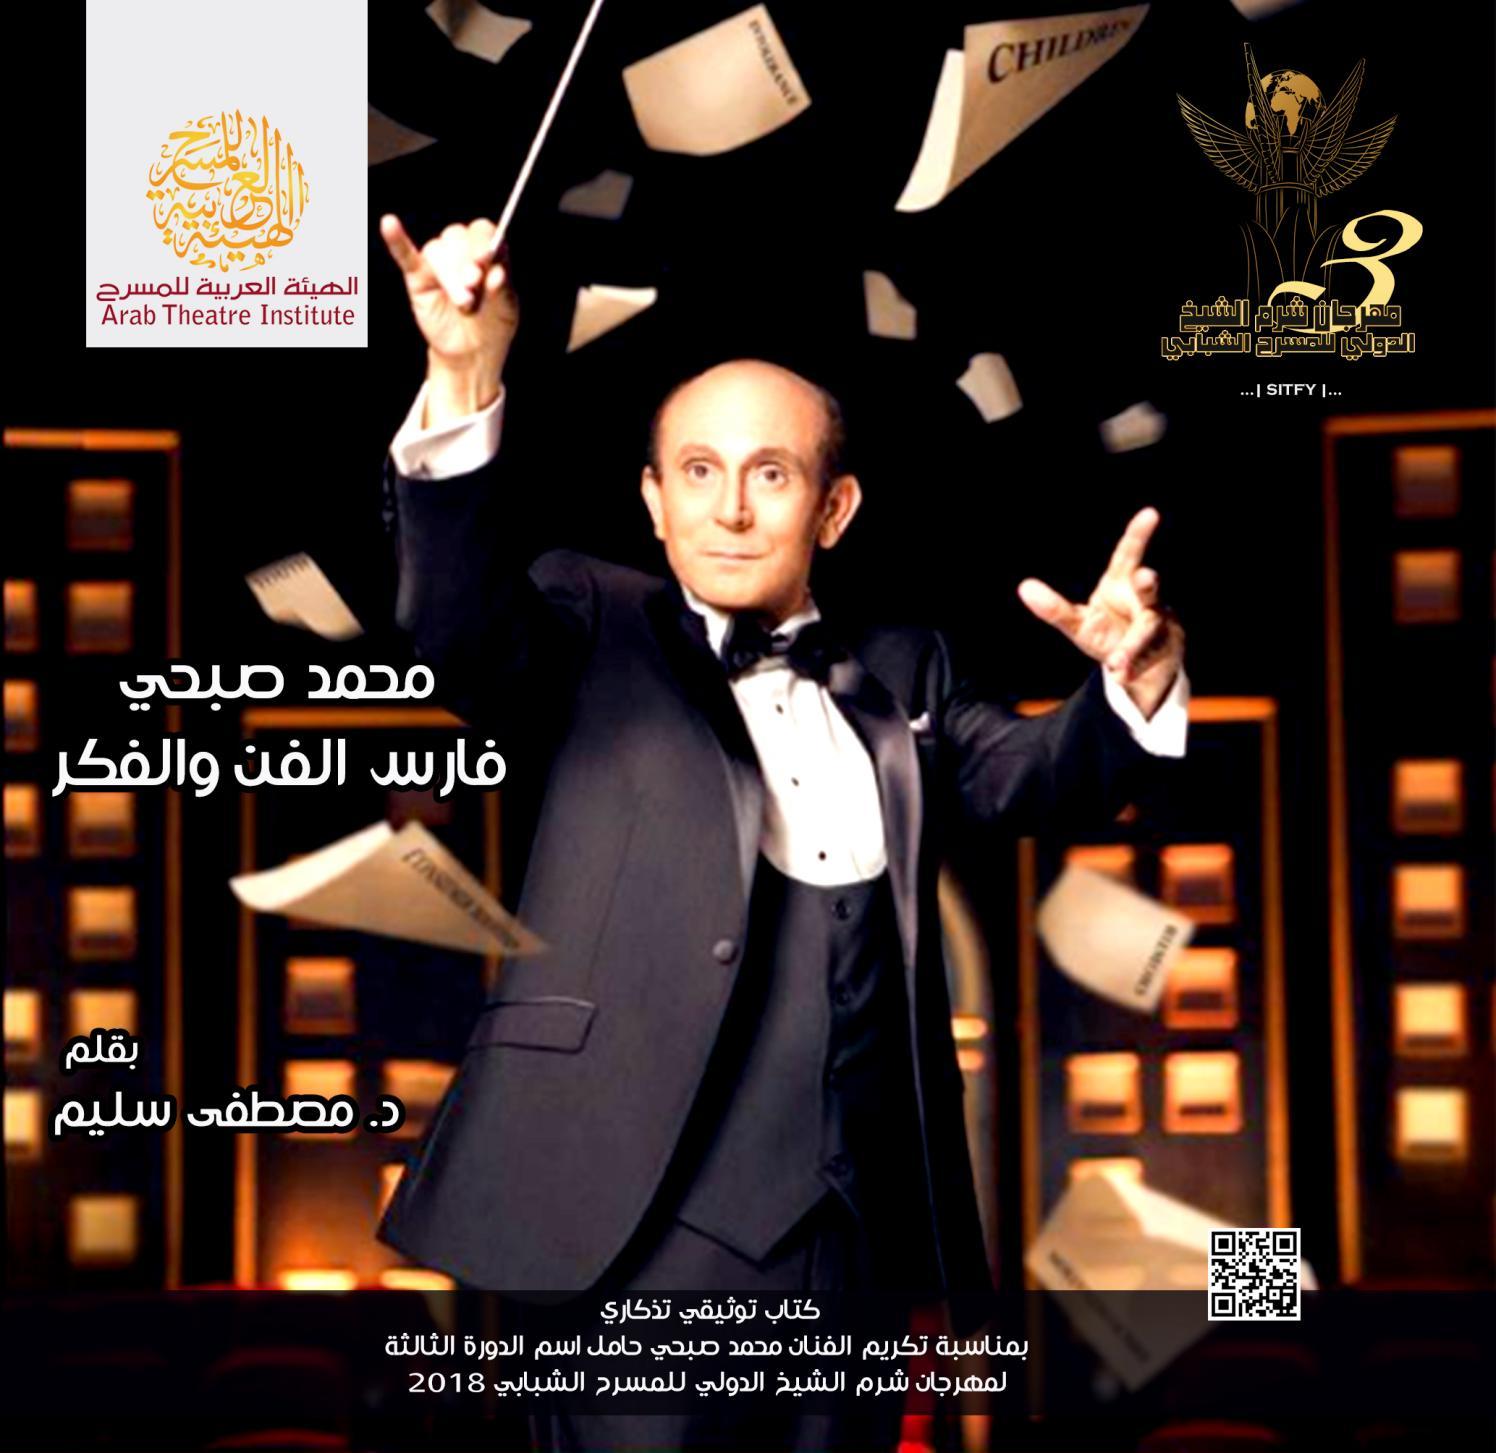 981421d73 محمد صبحي فارس الفن والفكر by 'Komy Mohamed' - issuu